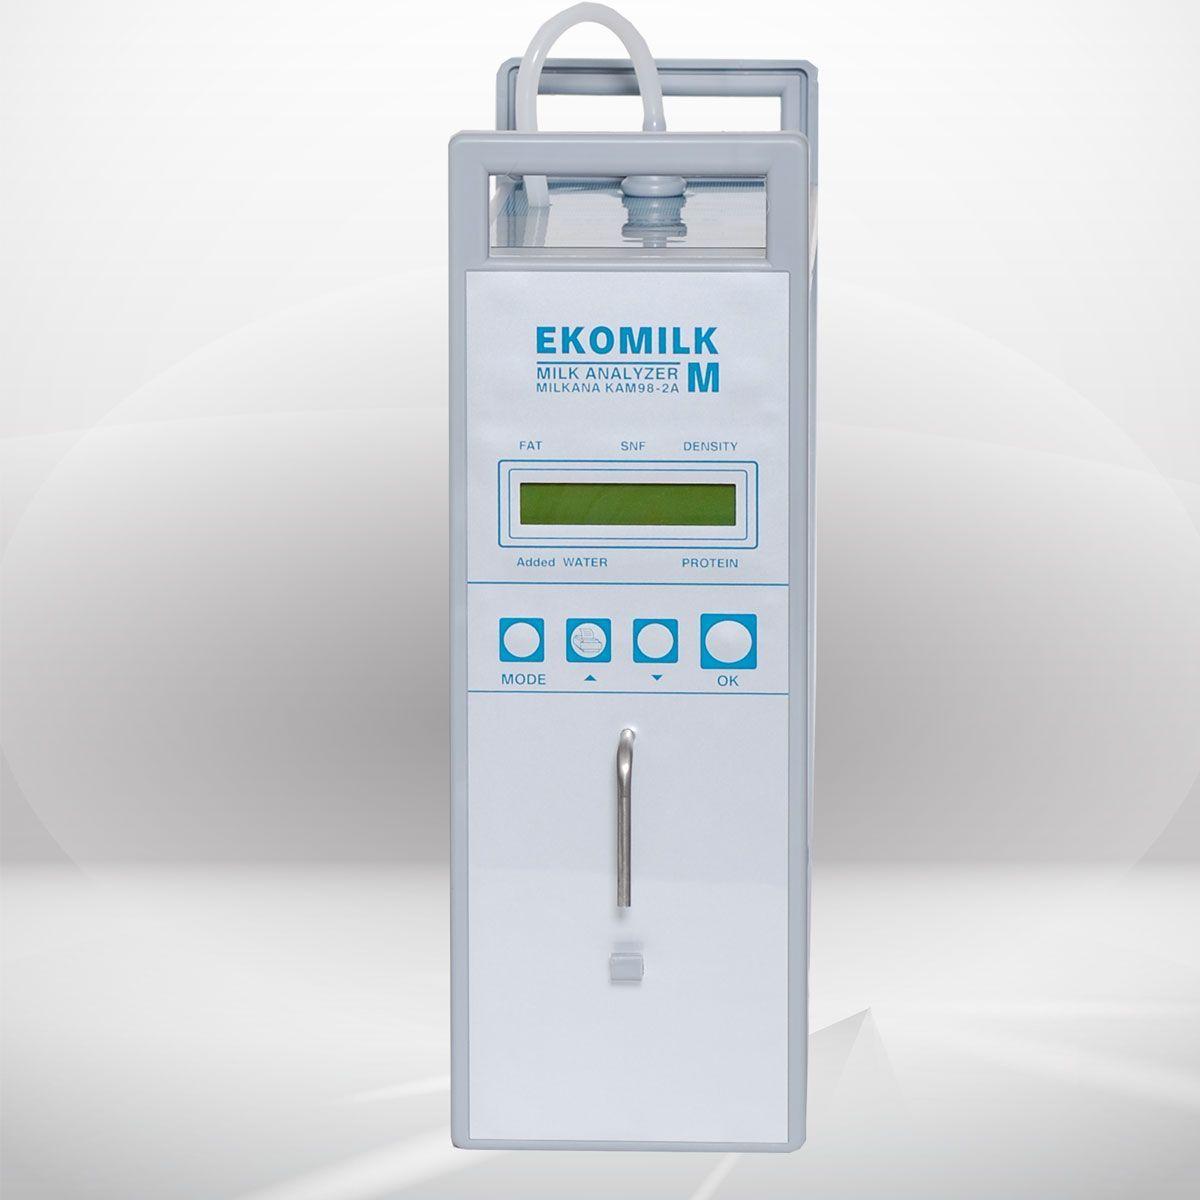 Máy phân tích sữa 90 giây, model: Ekomilk M